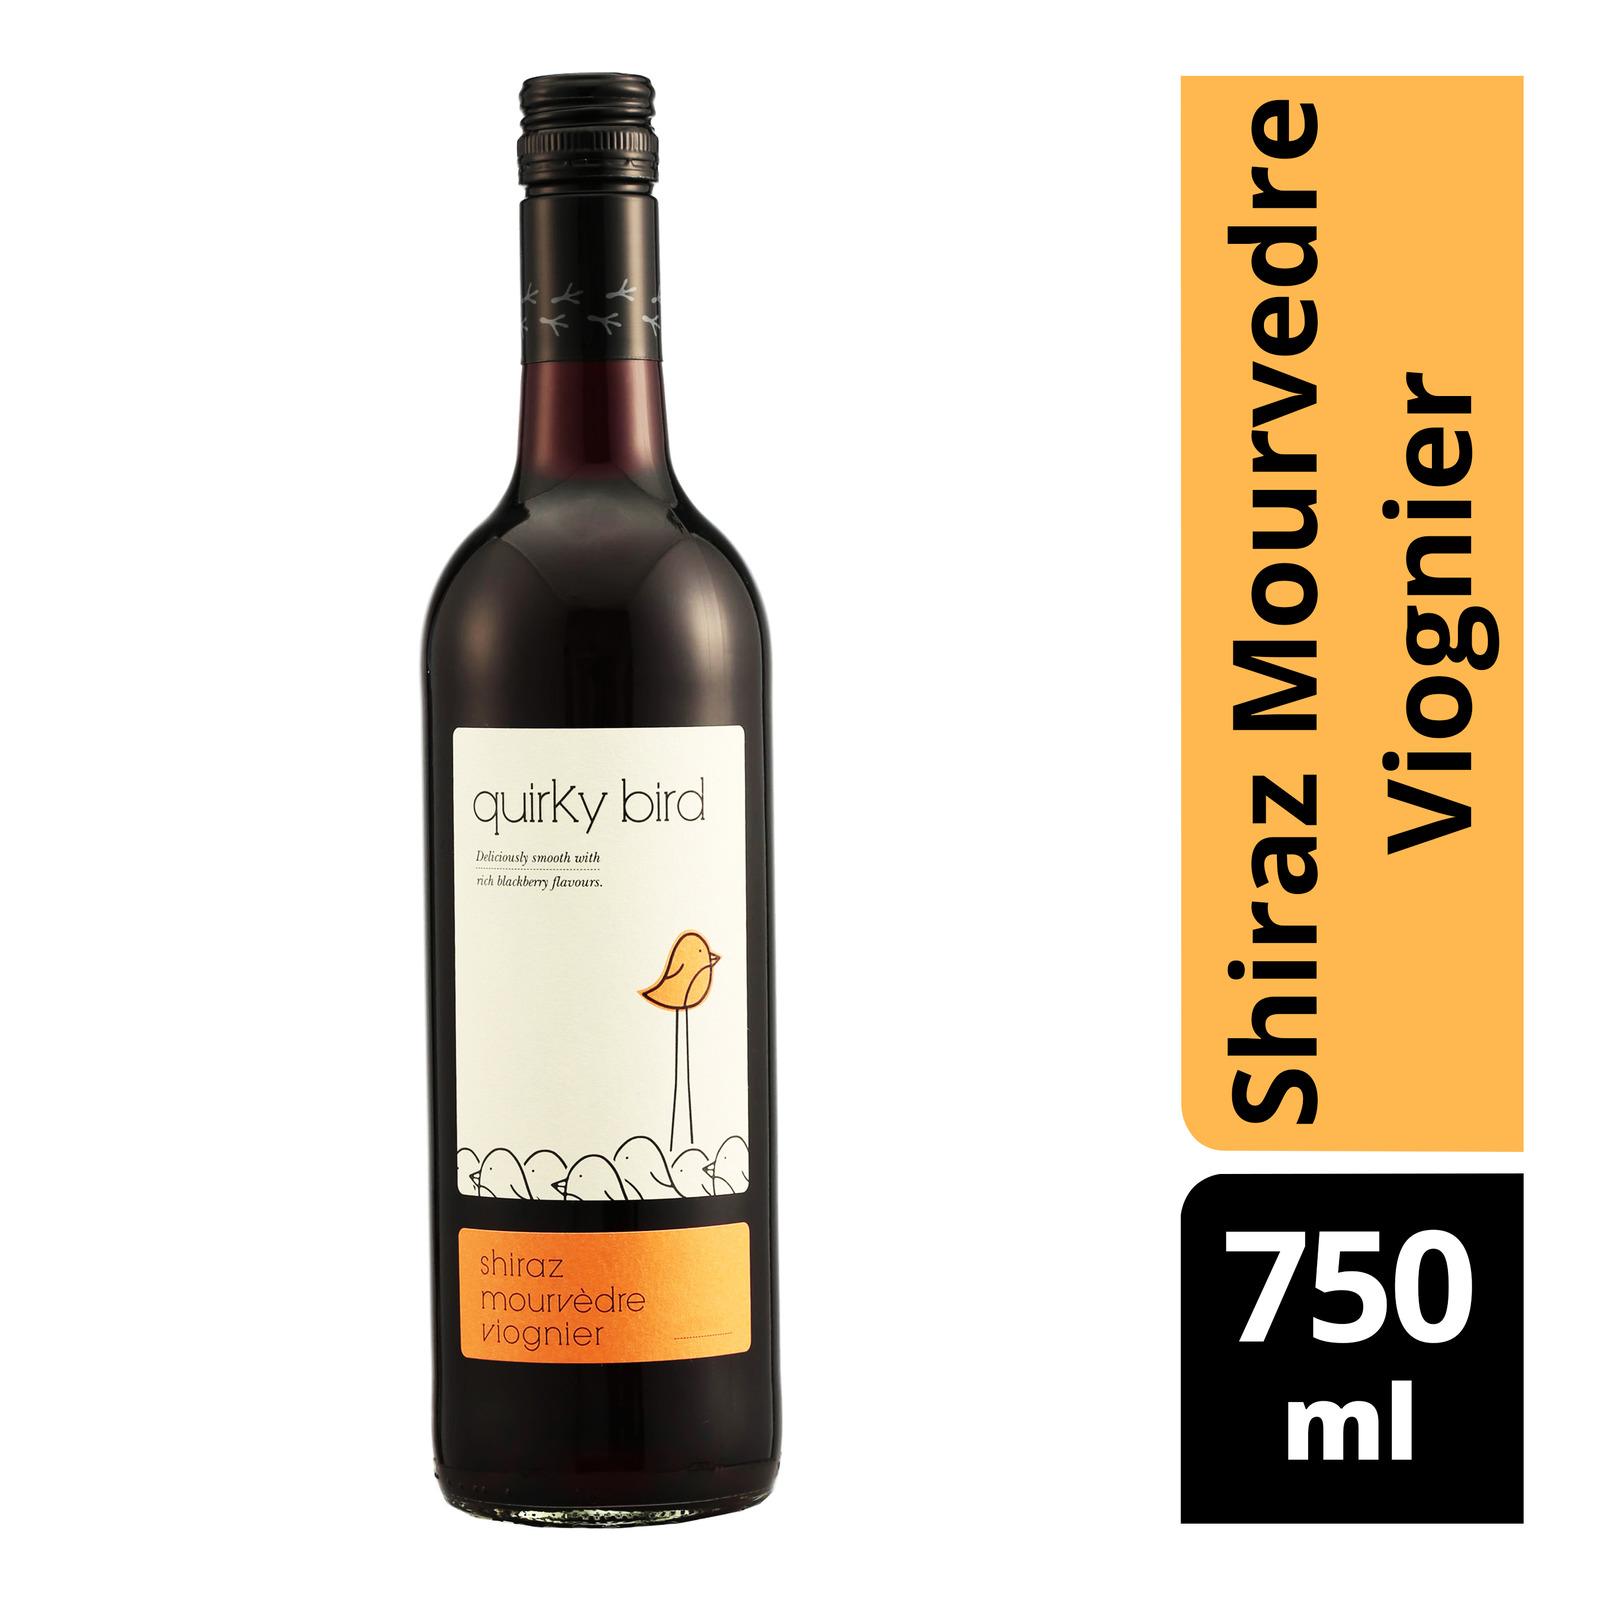 Tesco Quirky Bird Red Wine - Shiraz Mourvedre Viognier